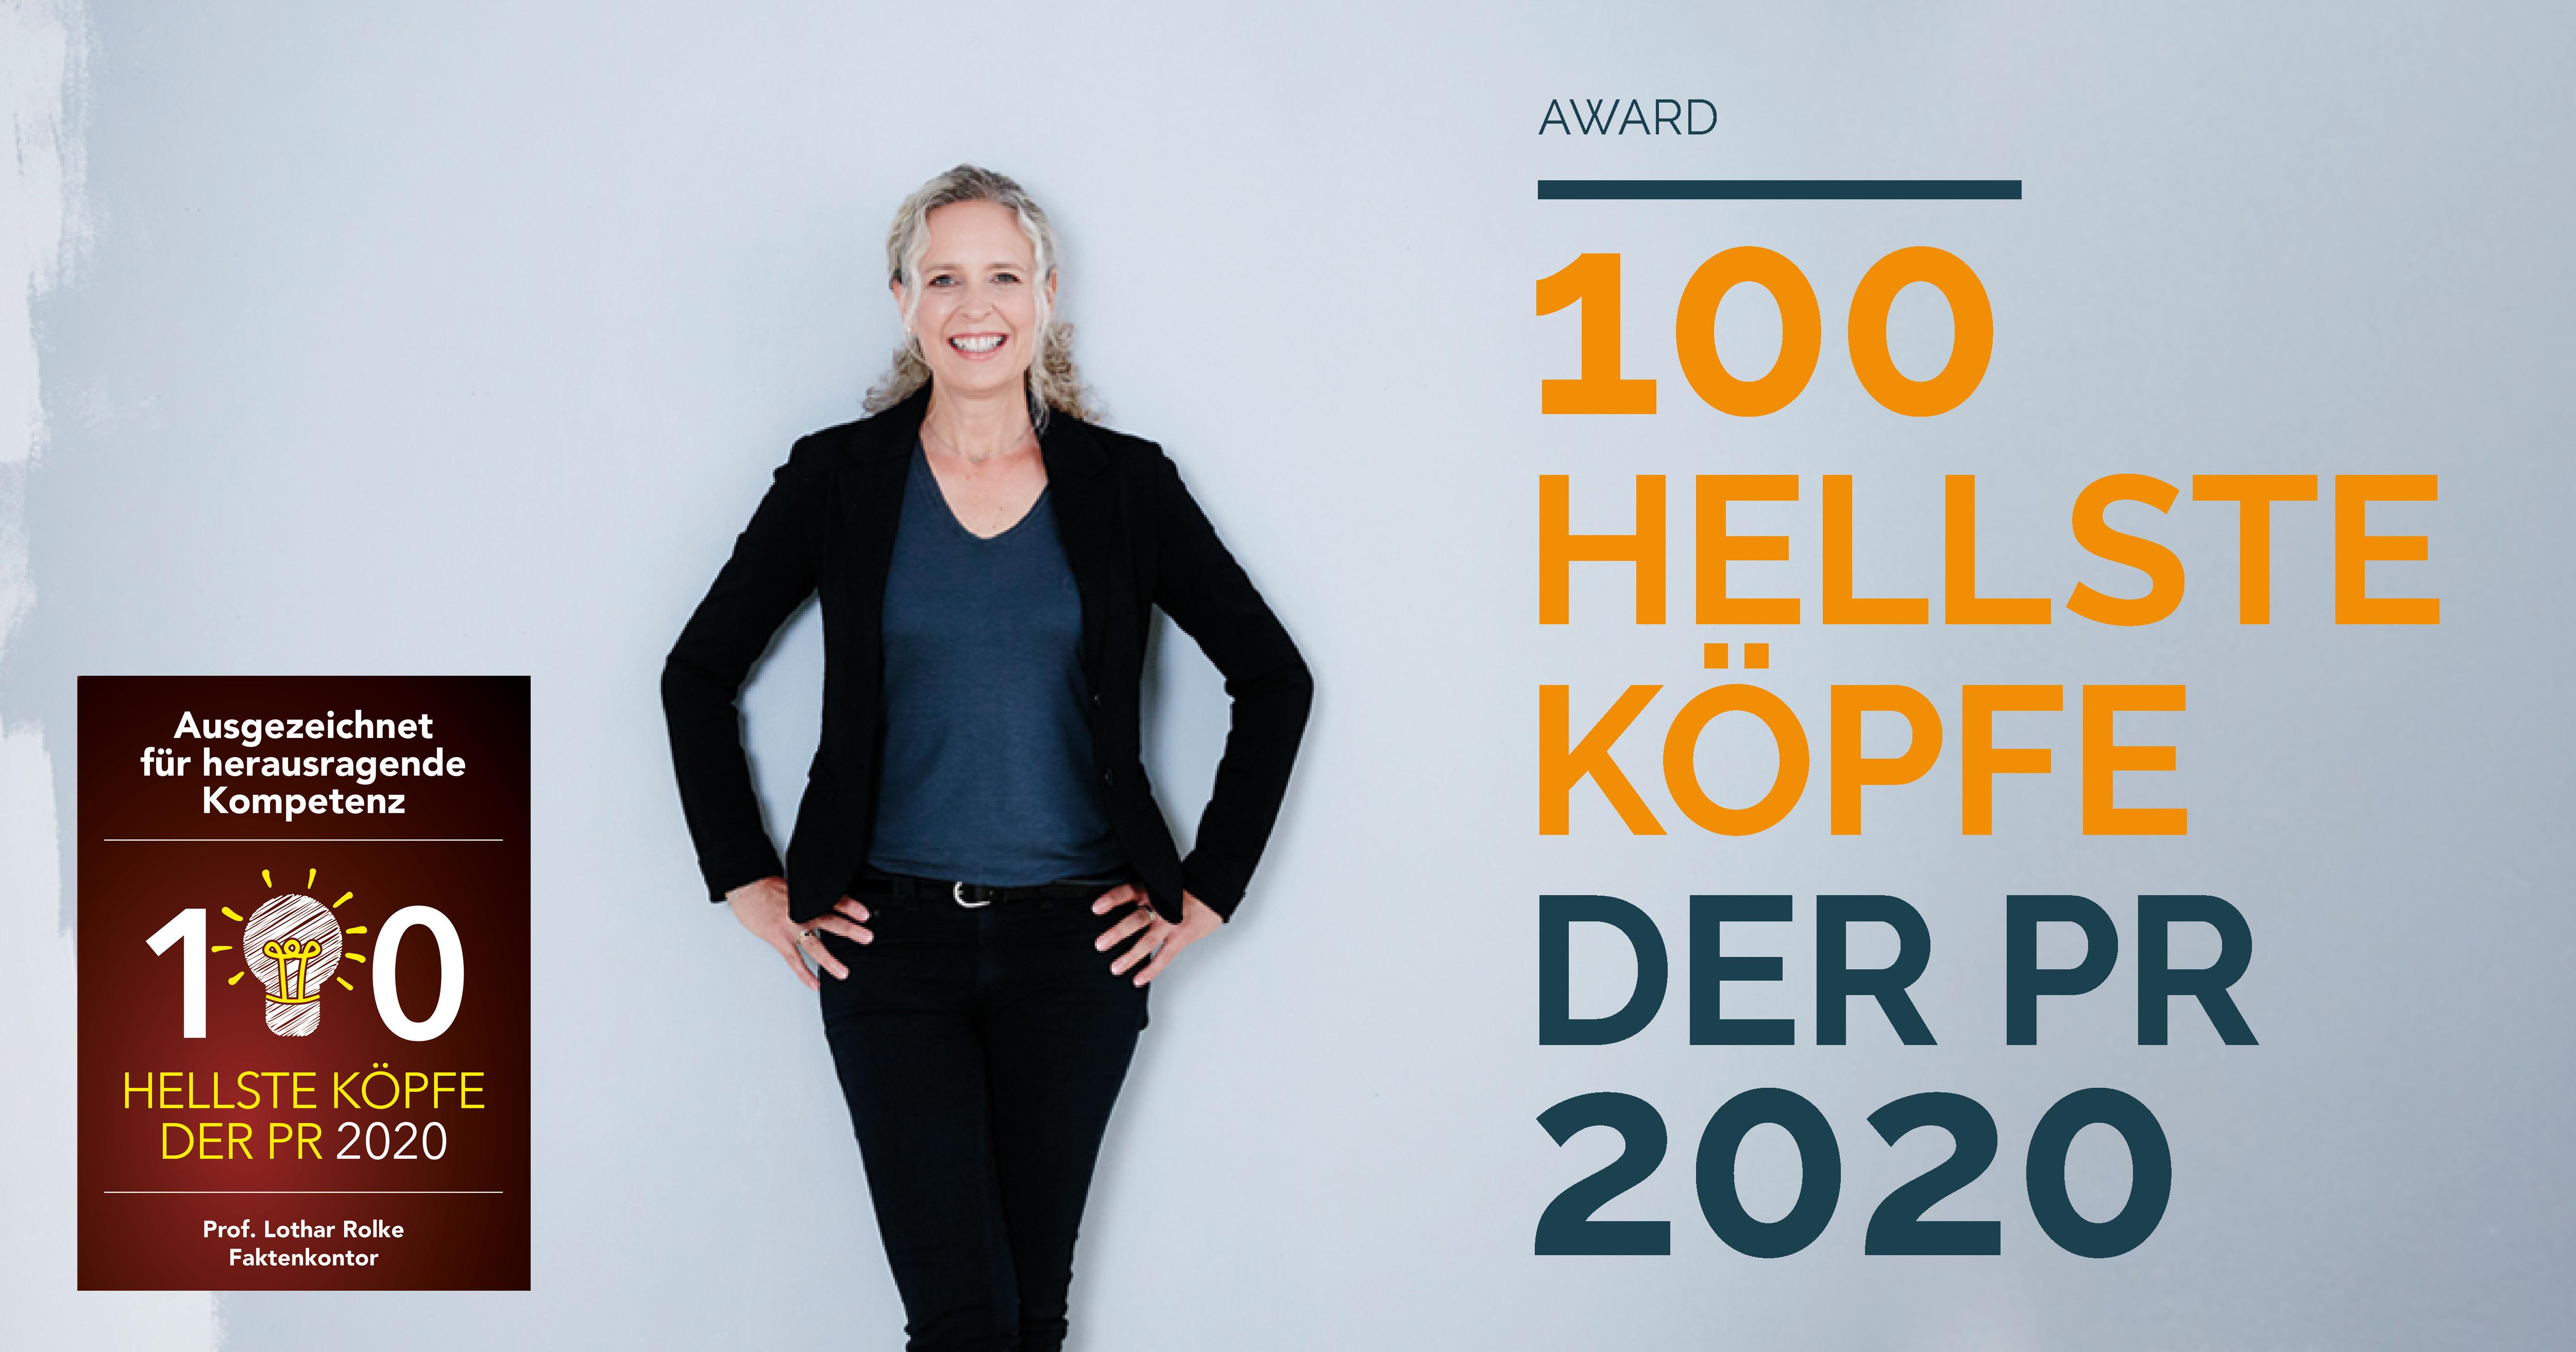 Hellste Köpfe der PR 2020: Katrin Möllers